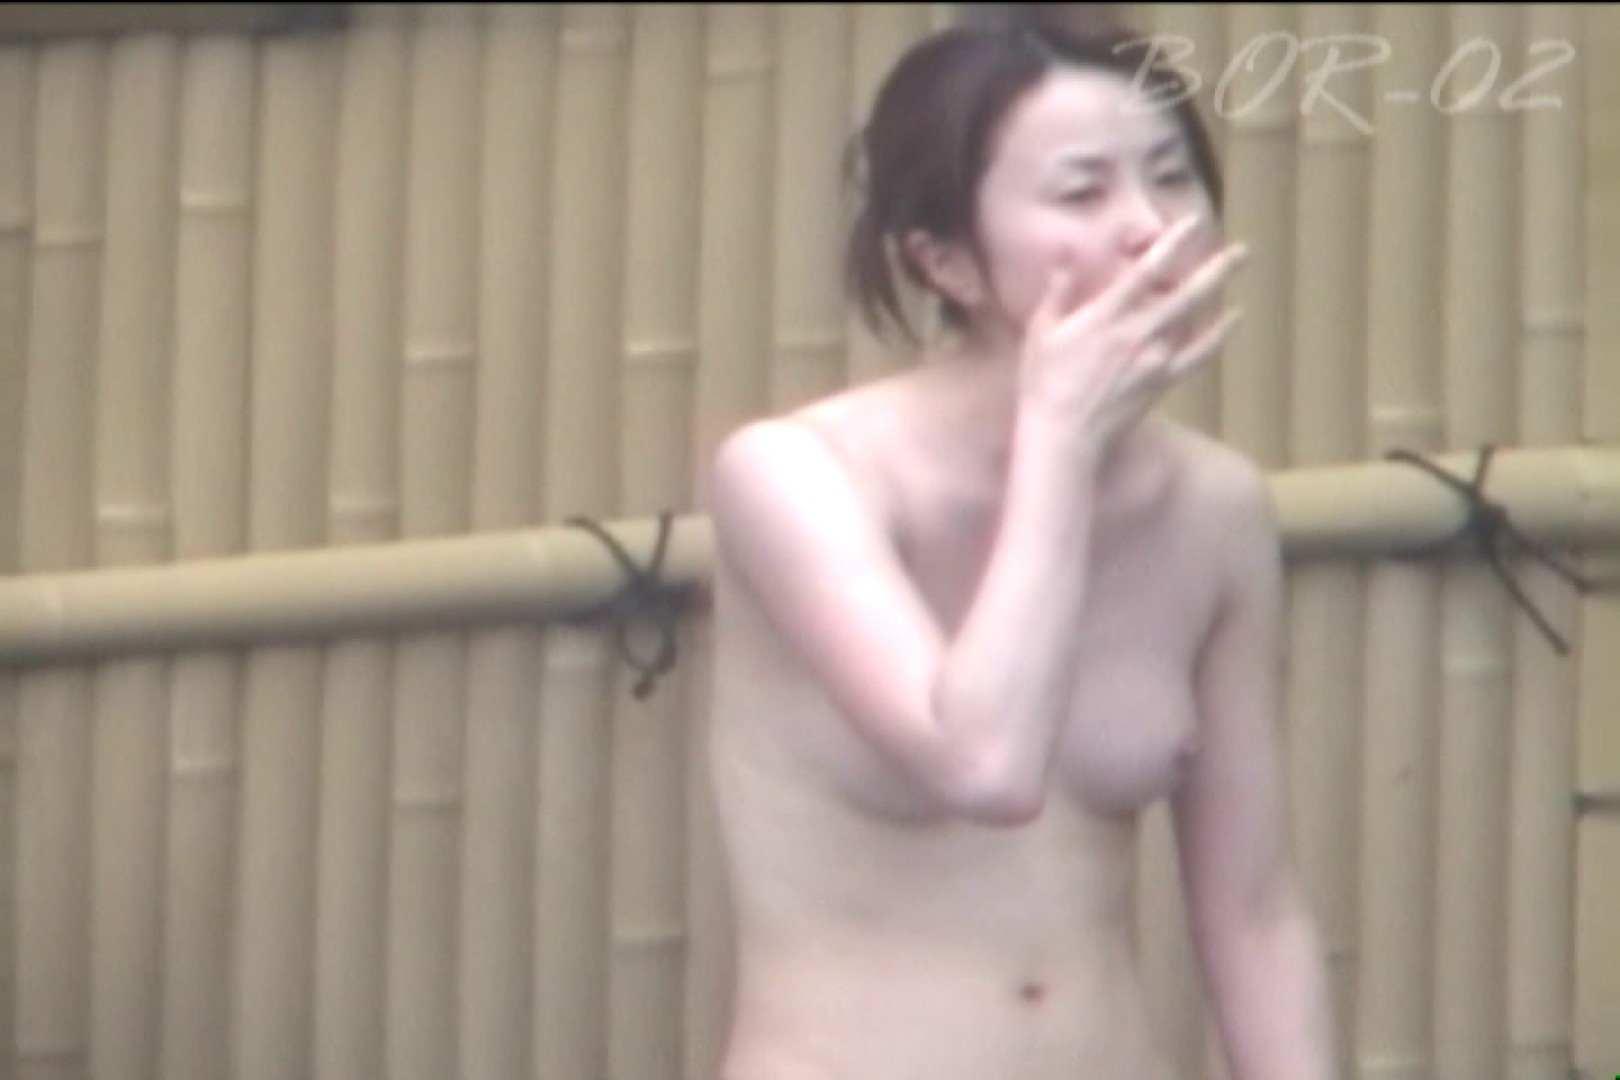 Aquaな露天風呂Vol.474 美しいOLの裸体 | 露天風呂突入  84pic 55